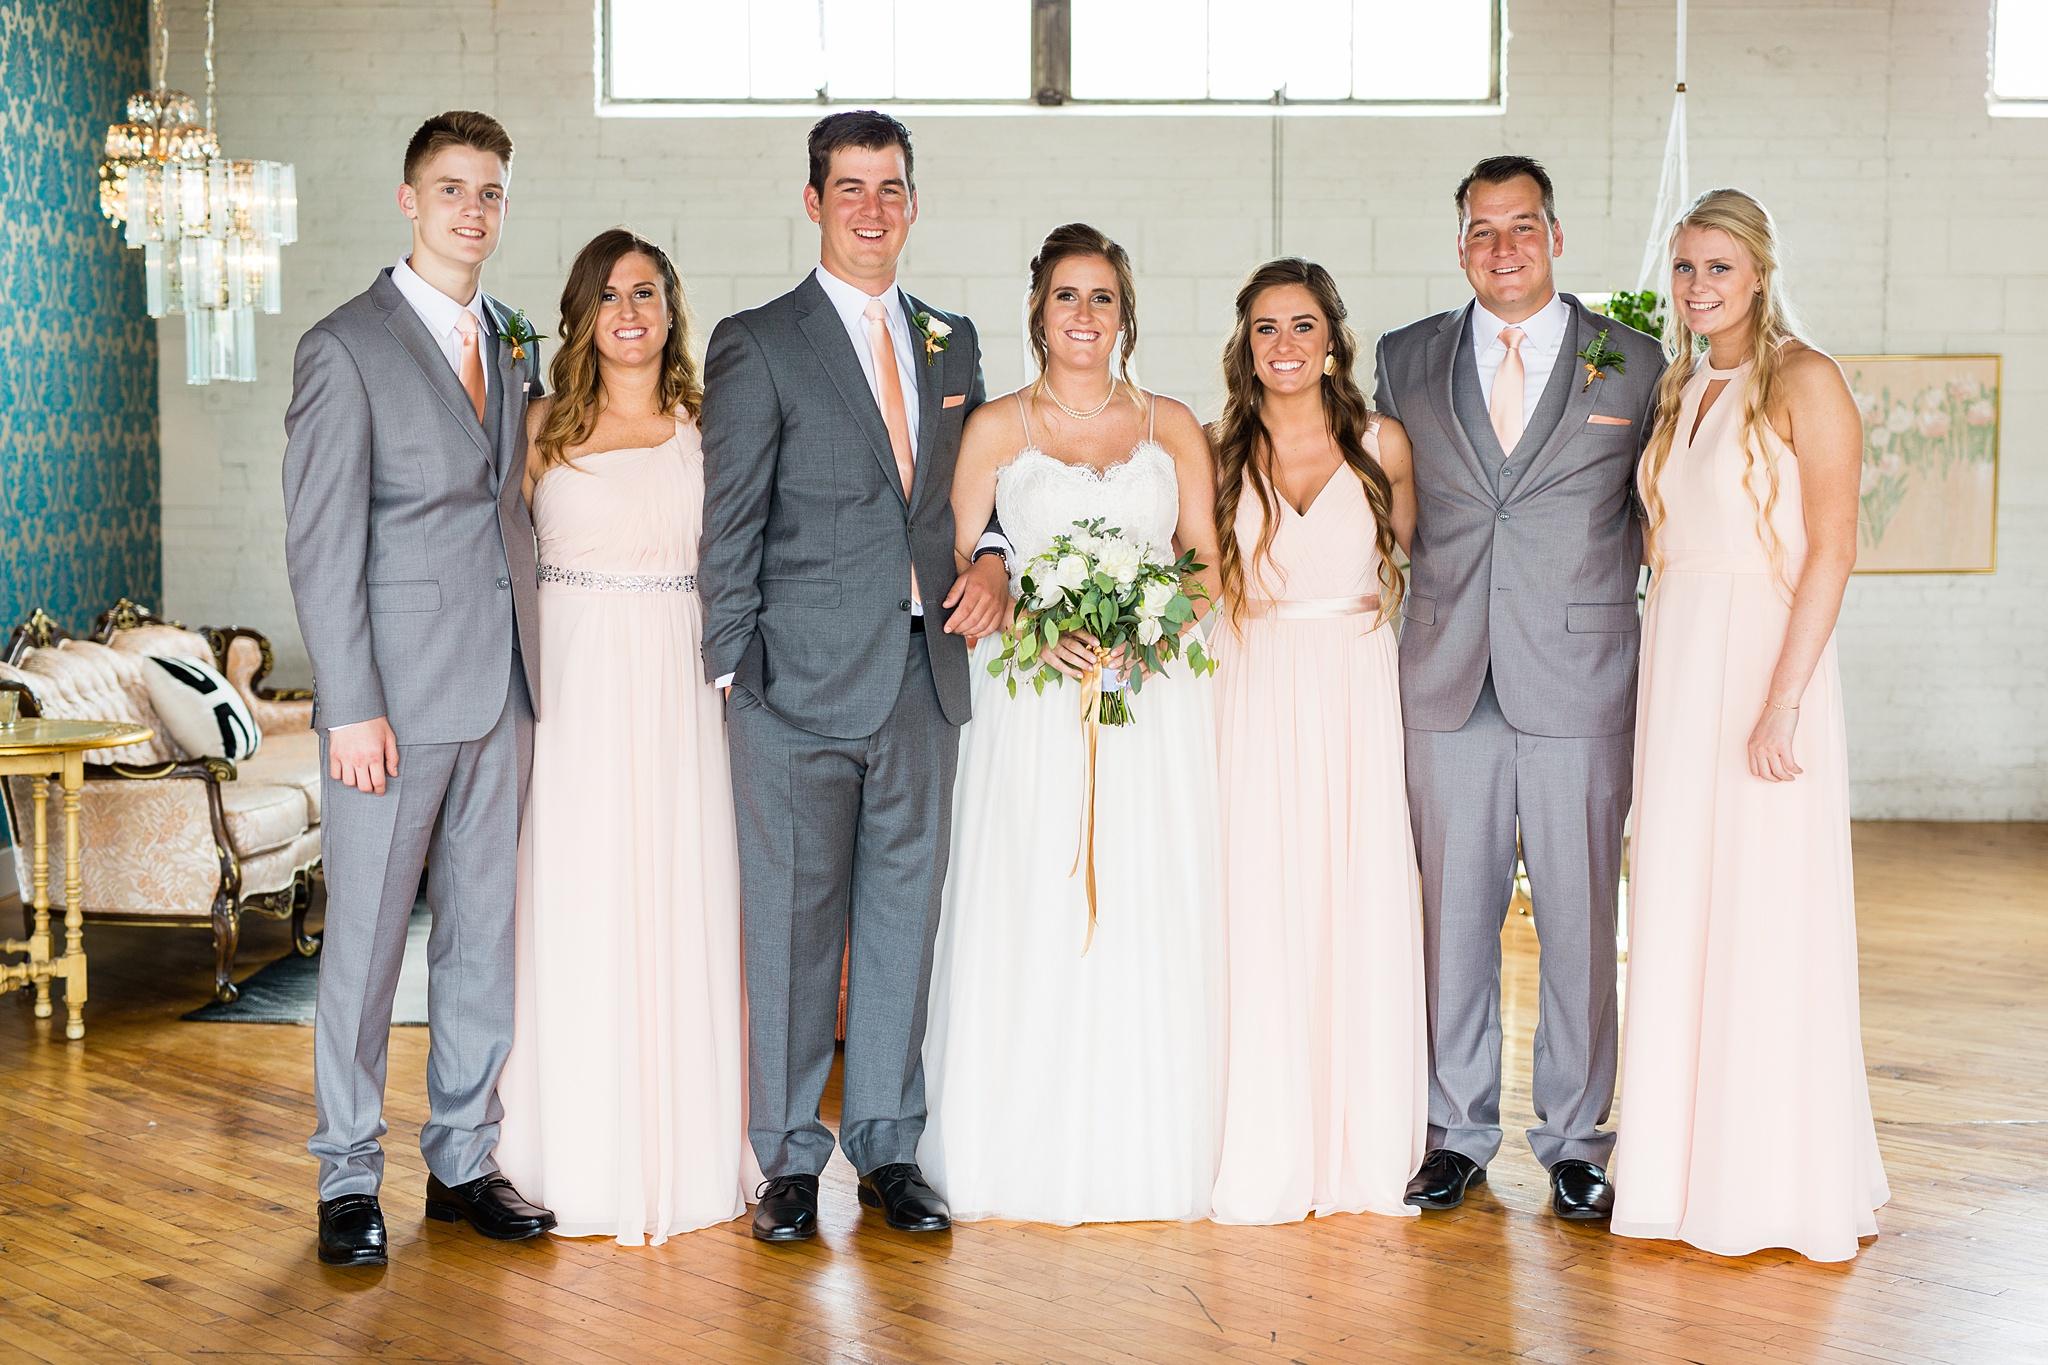 Meghan_Drew_Grand_Rapids_Cheney_place_Wedding033.JPG